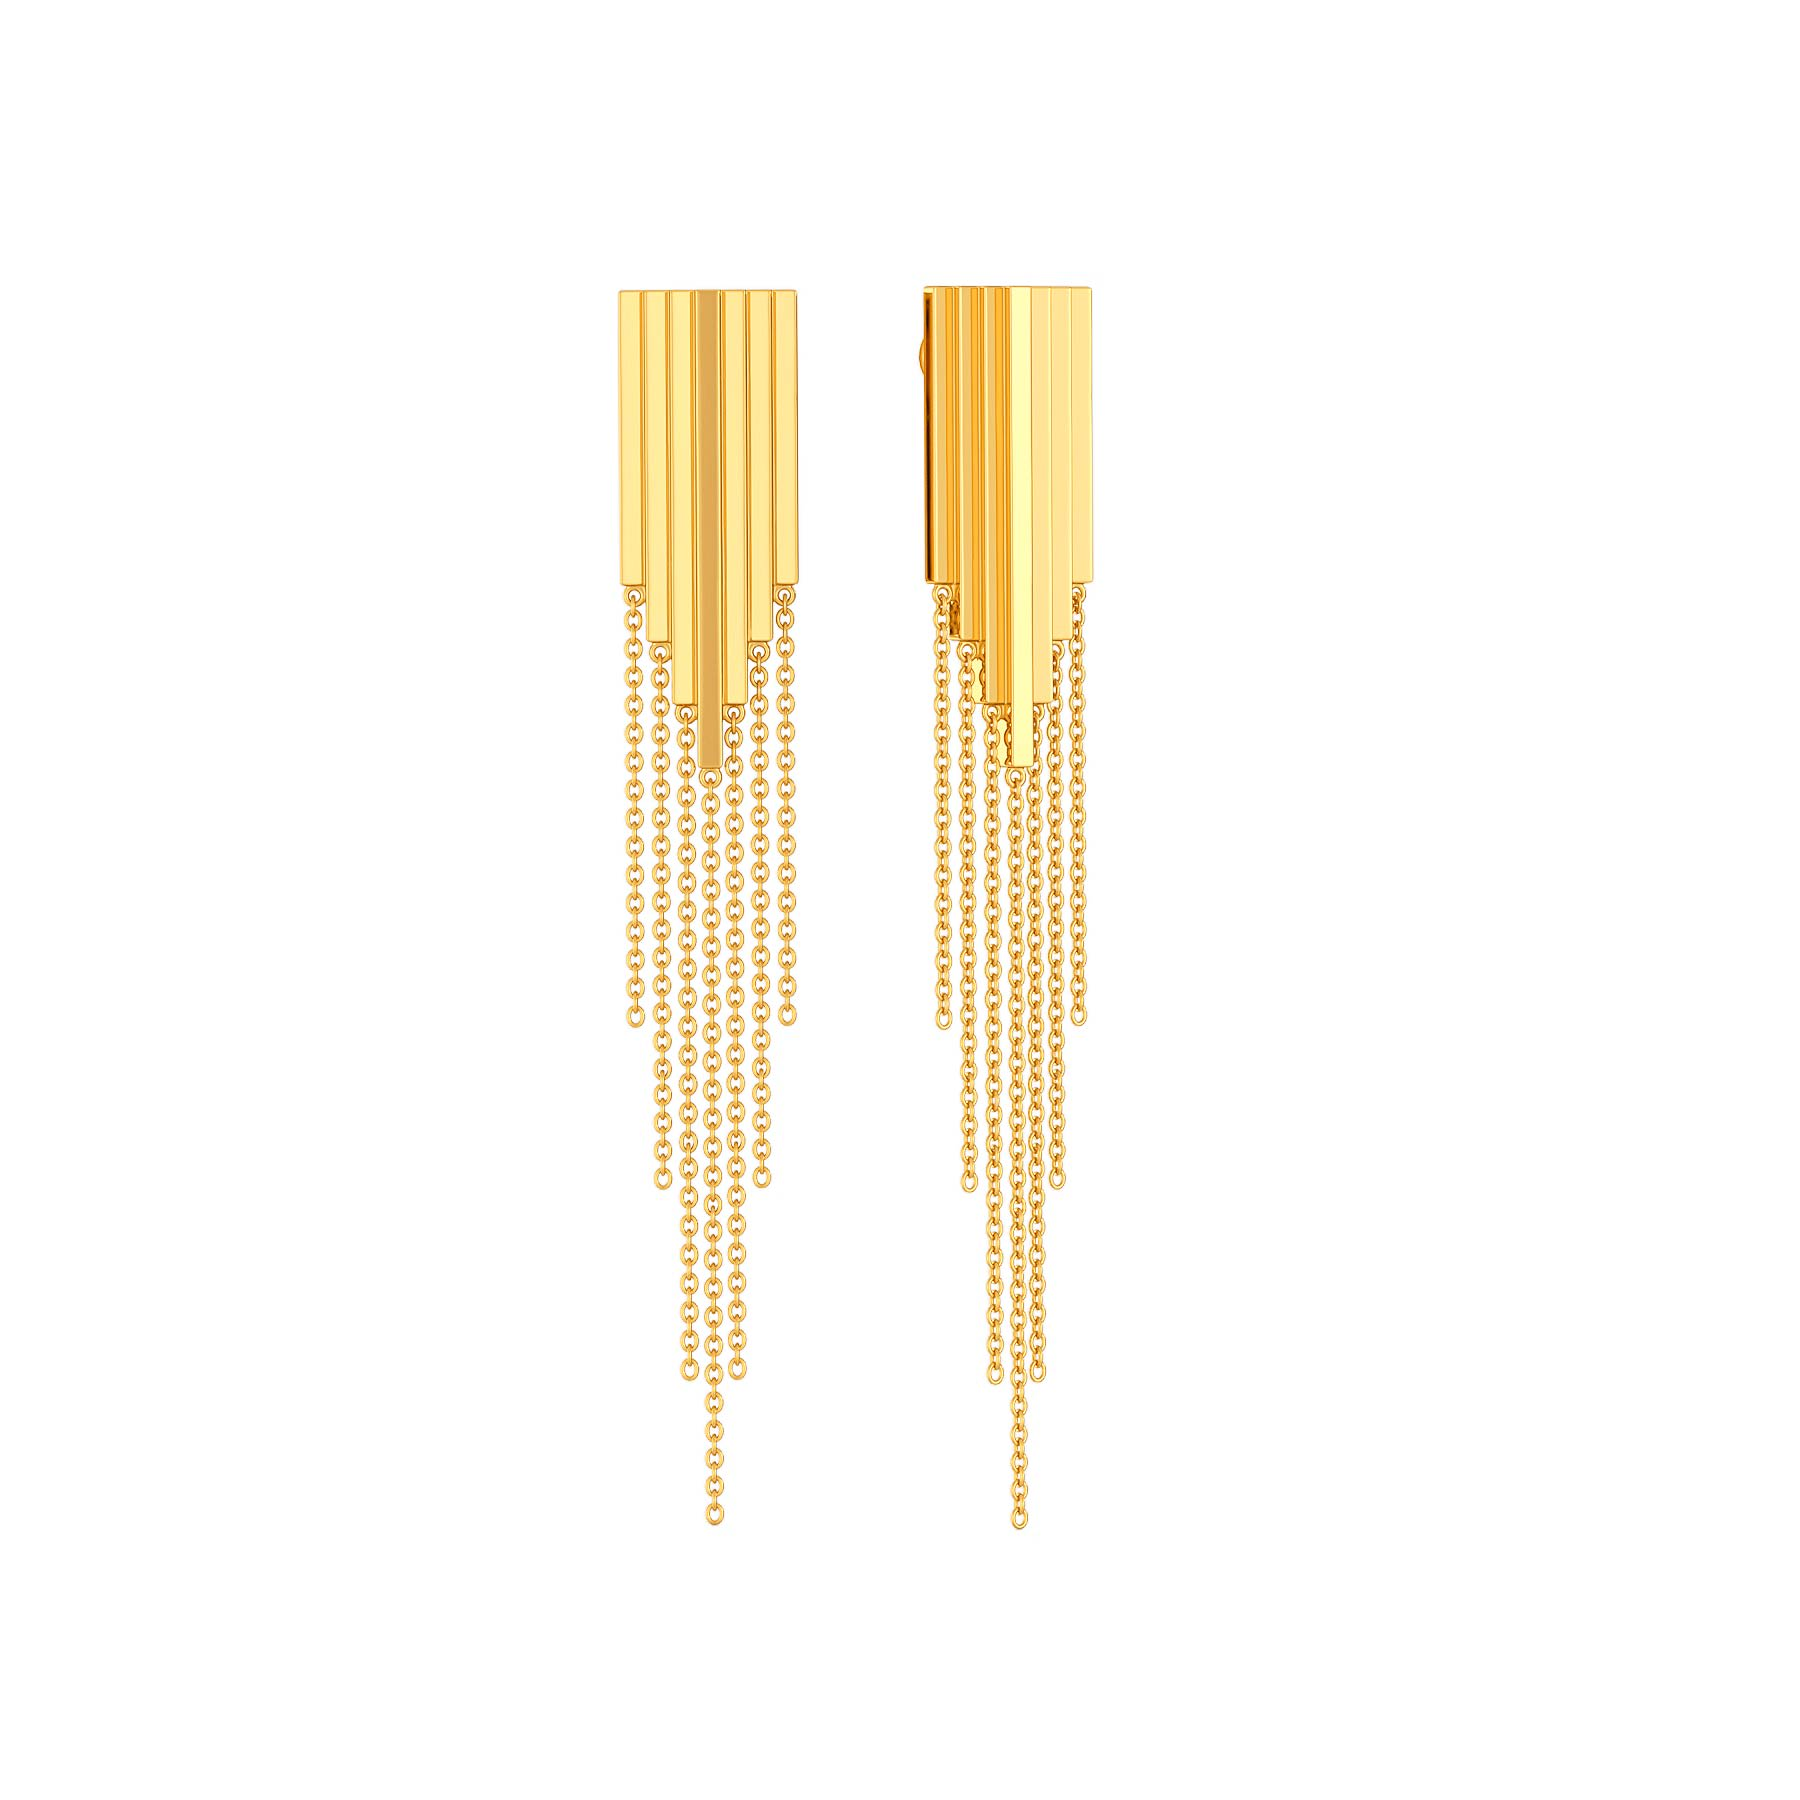 Fringe O Fashion Gold Earrings